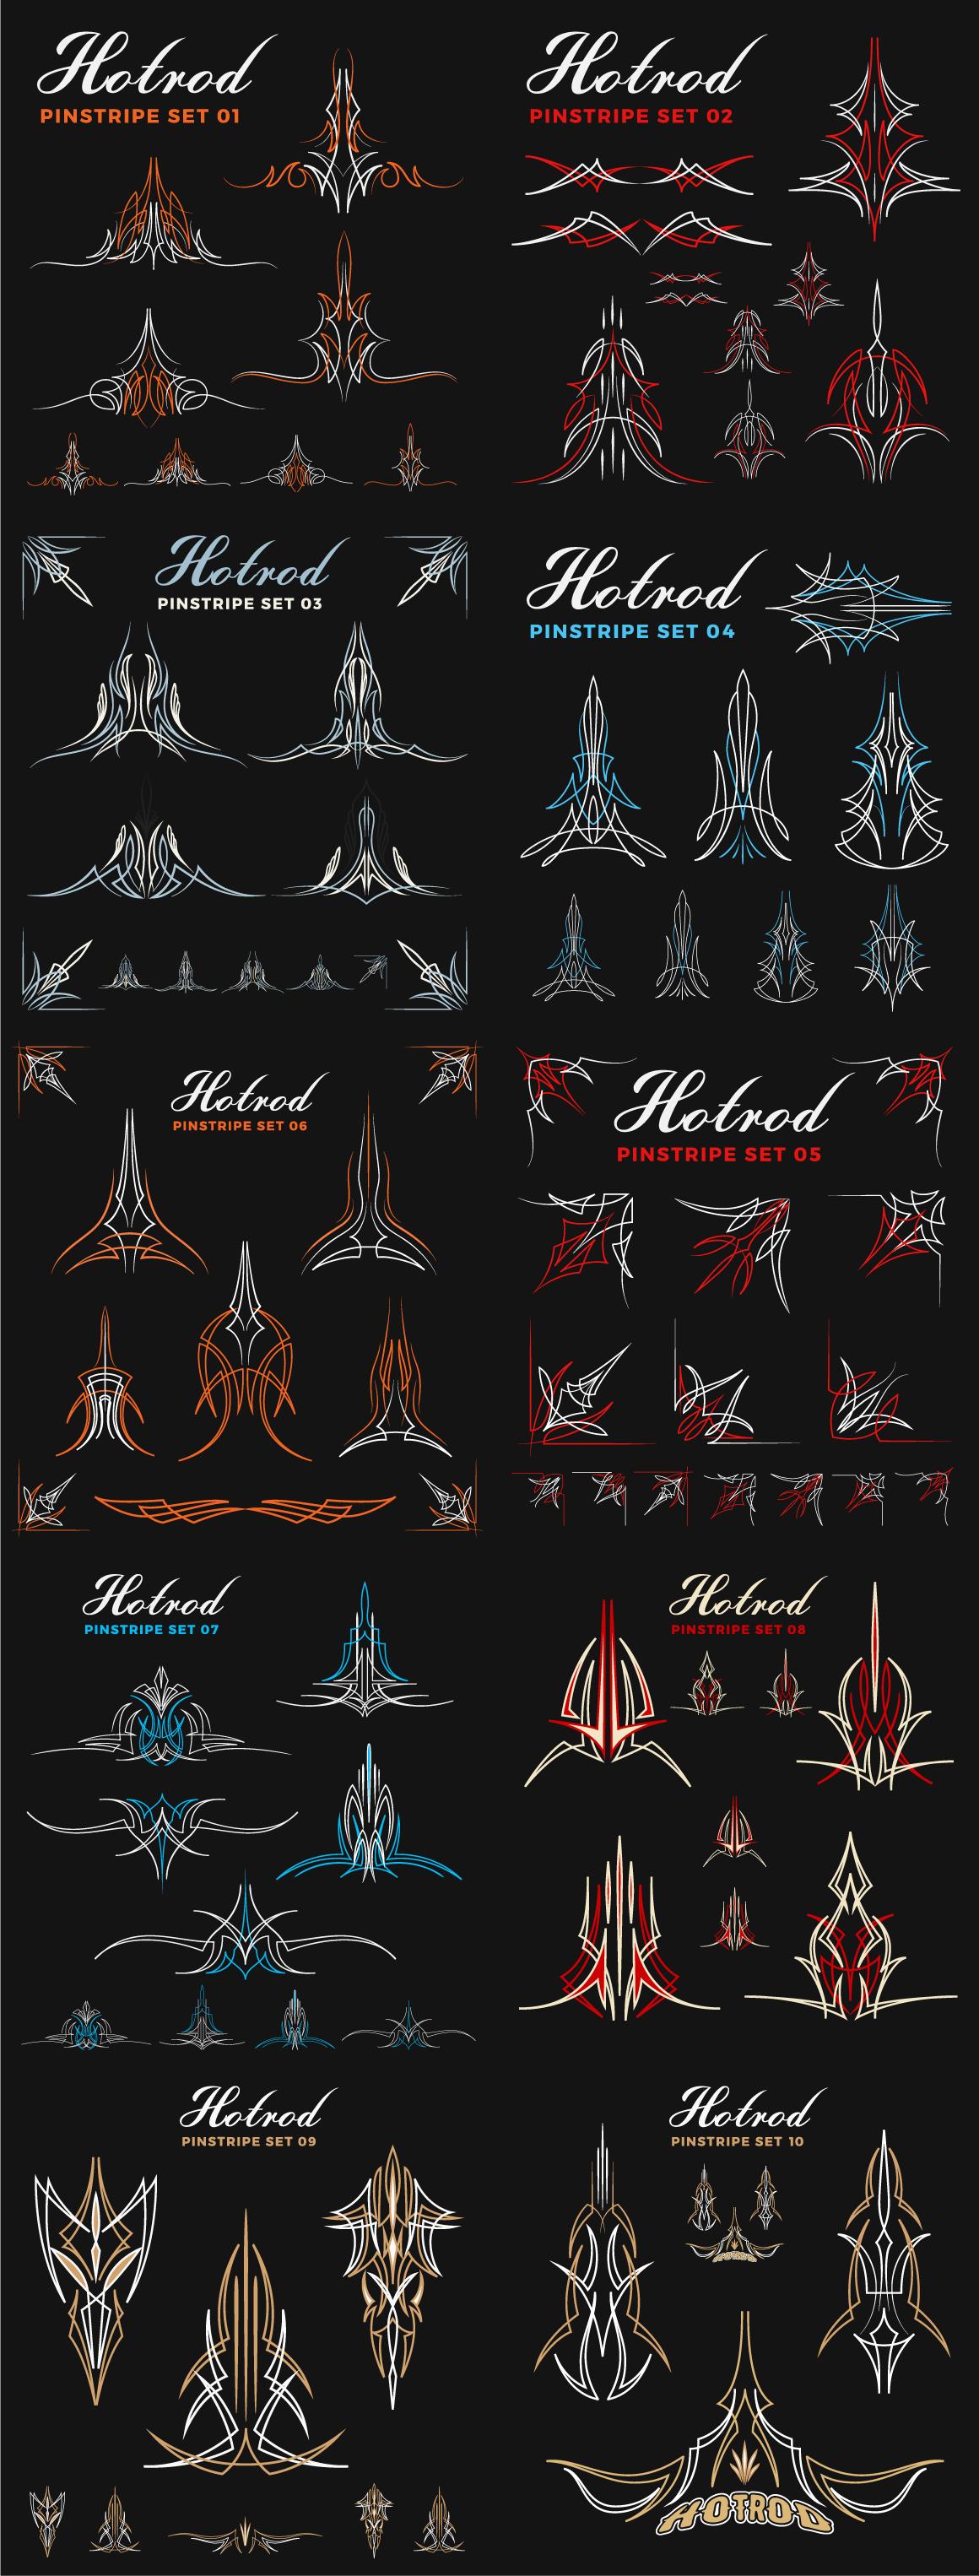 Hotrod Pinstripe Decoration & Design Elements example image 3